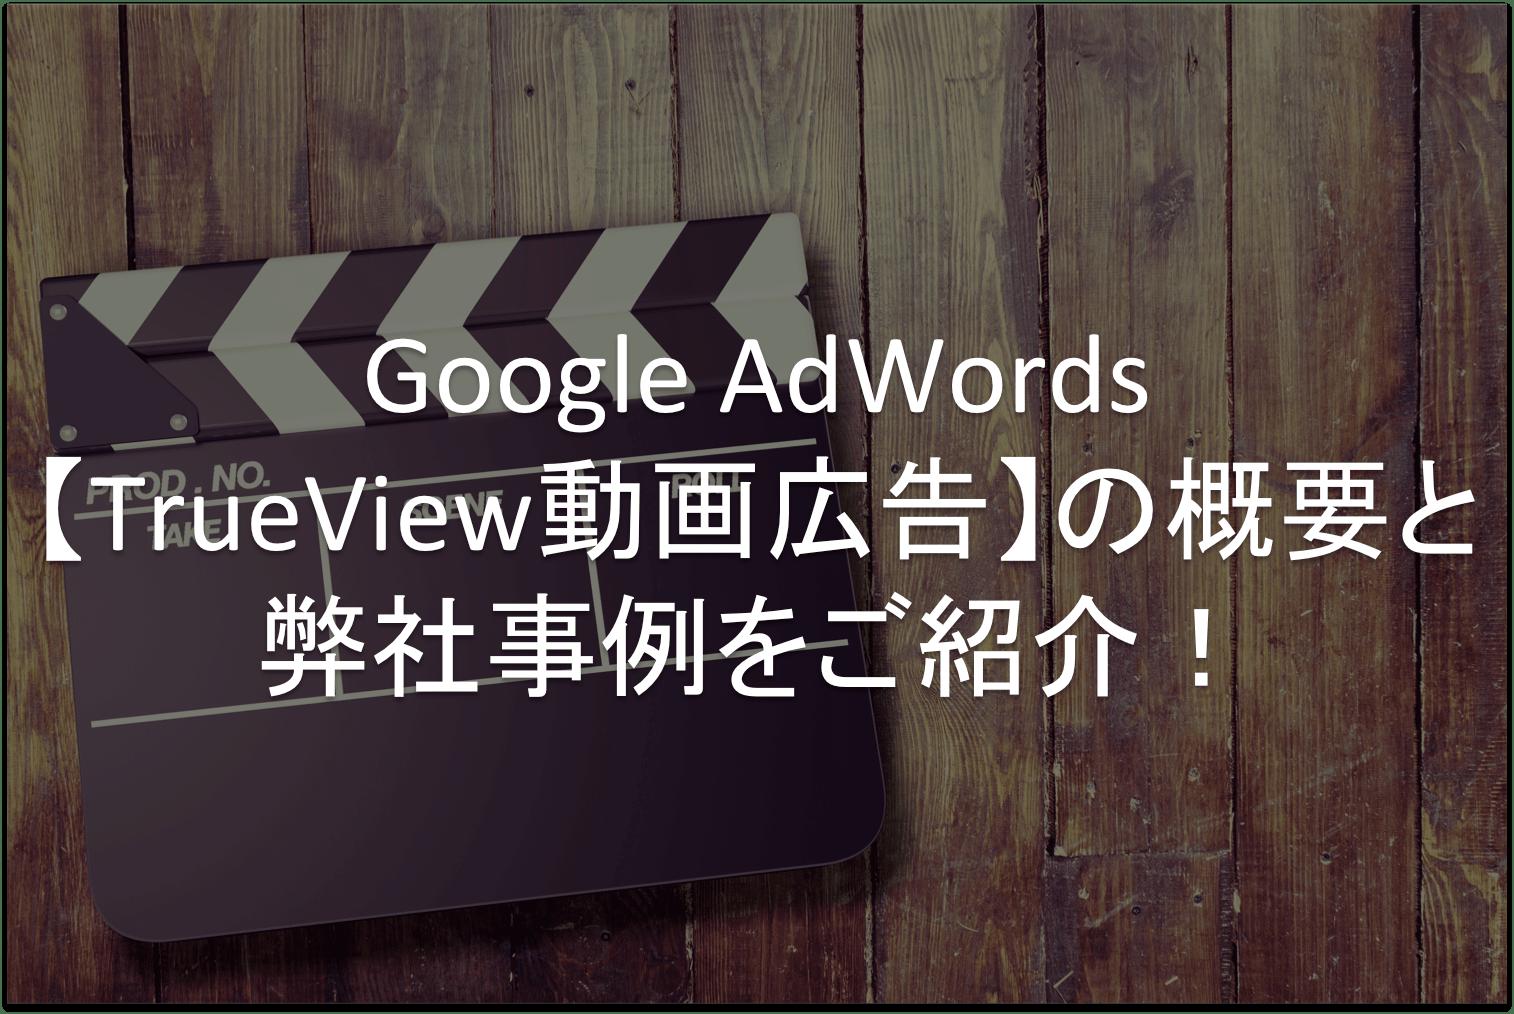 Google AdWords,動画